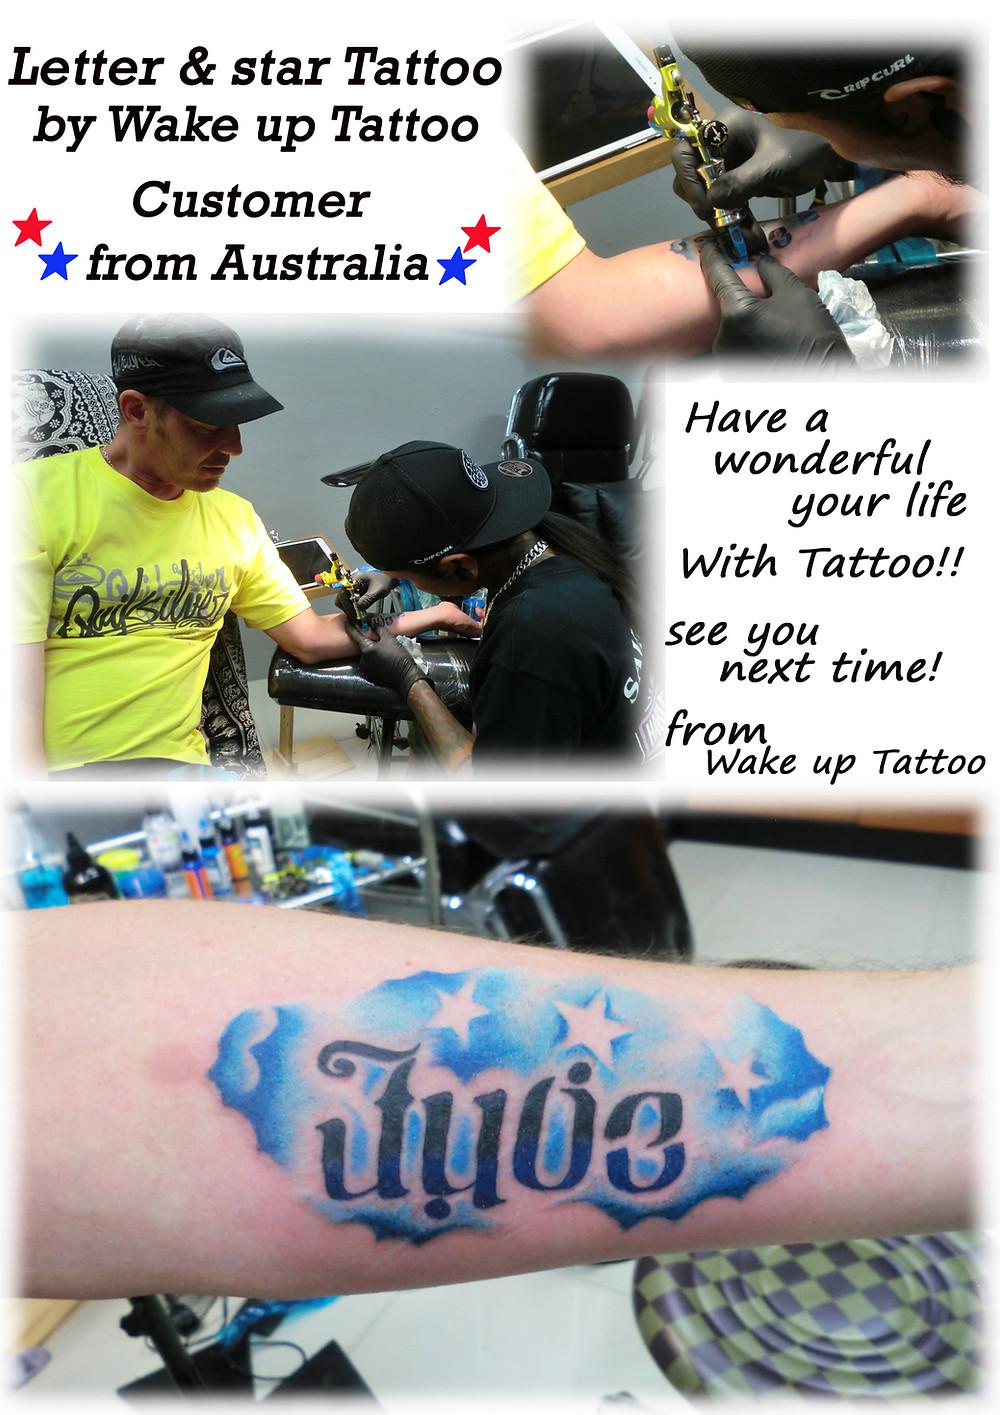 letter & star Tattoo by Wake up Tattoo Phuket